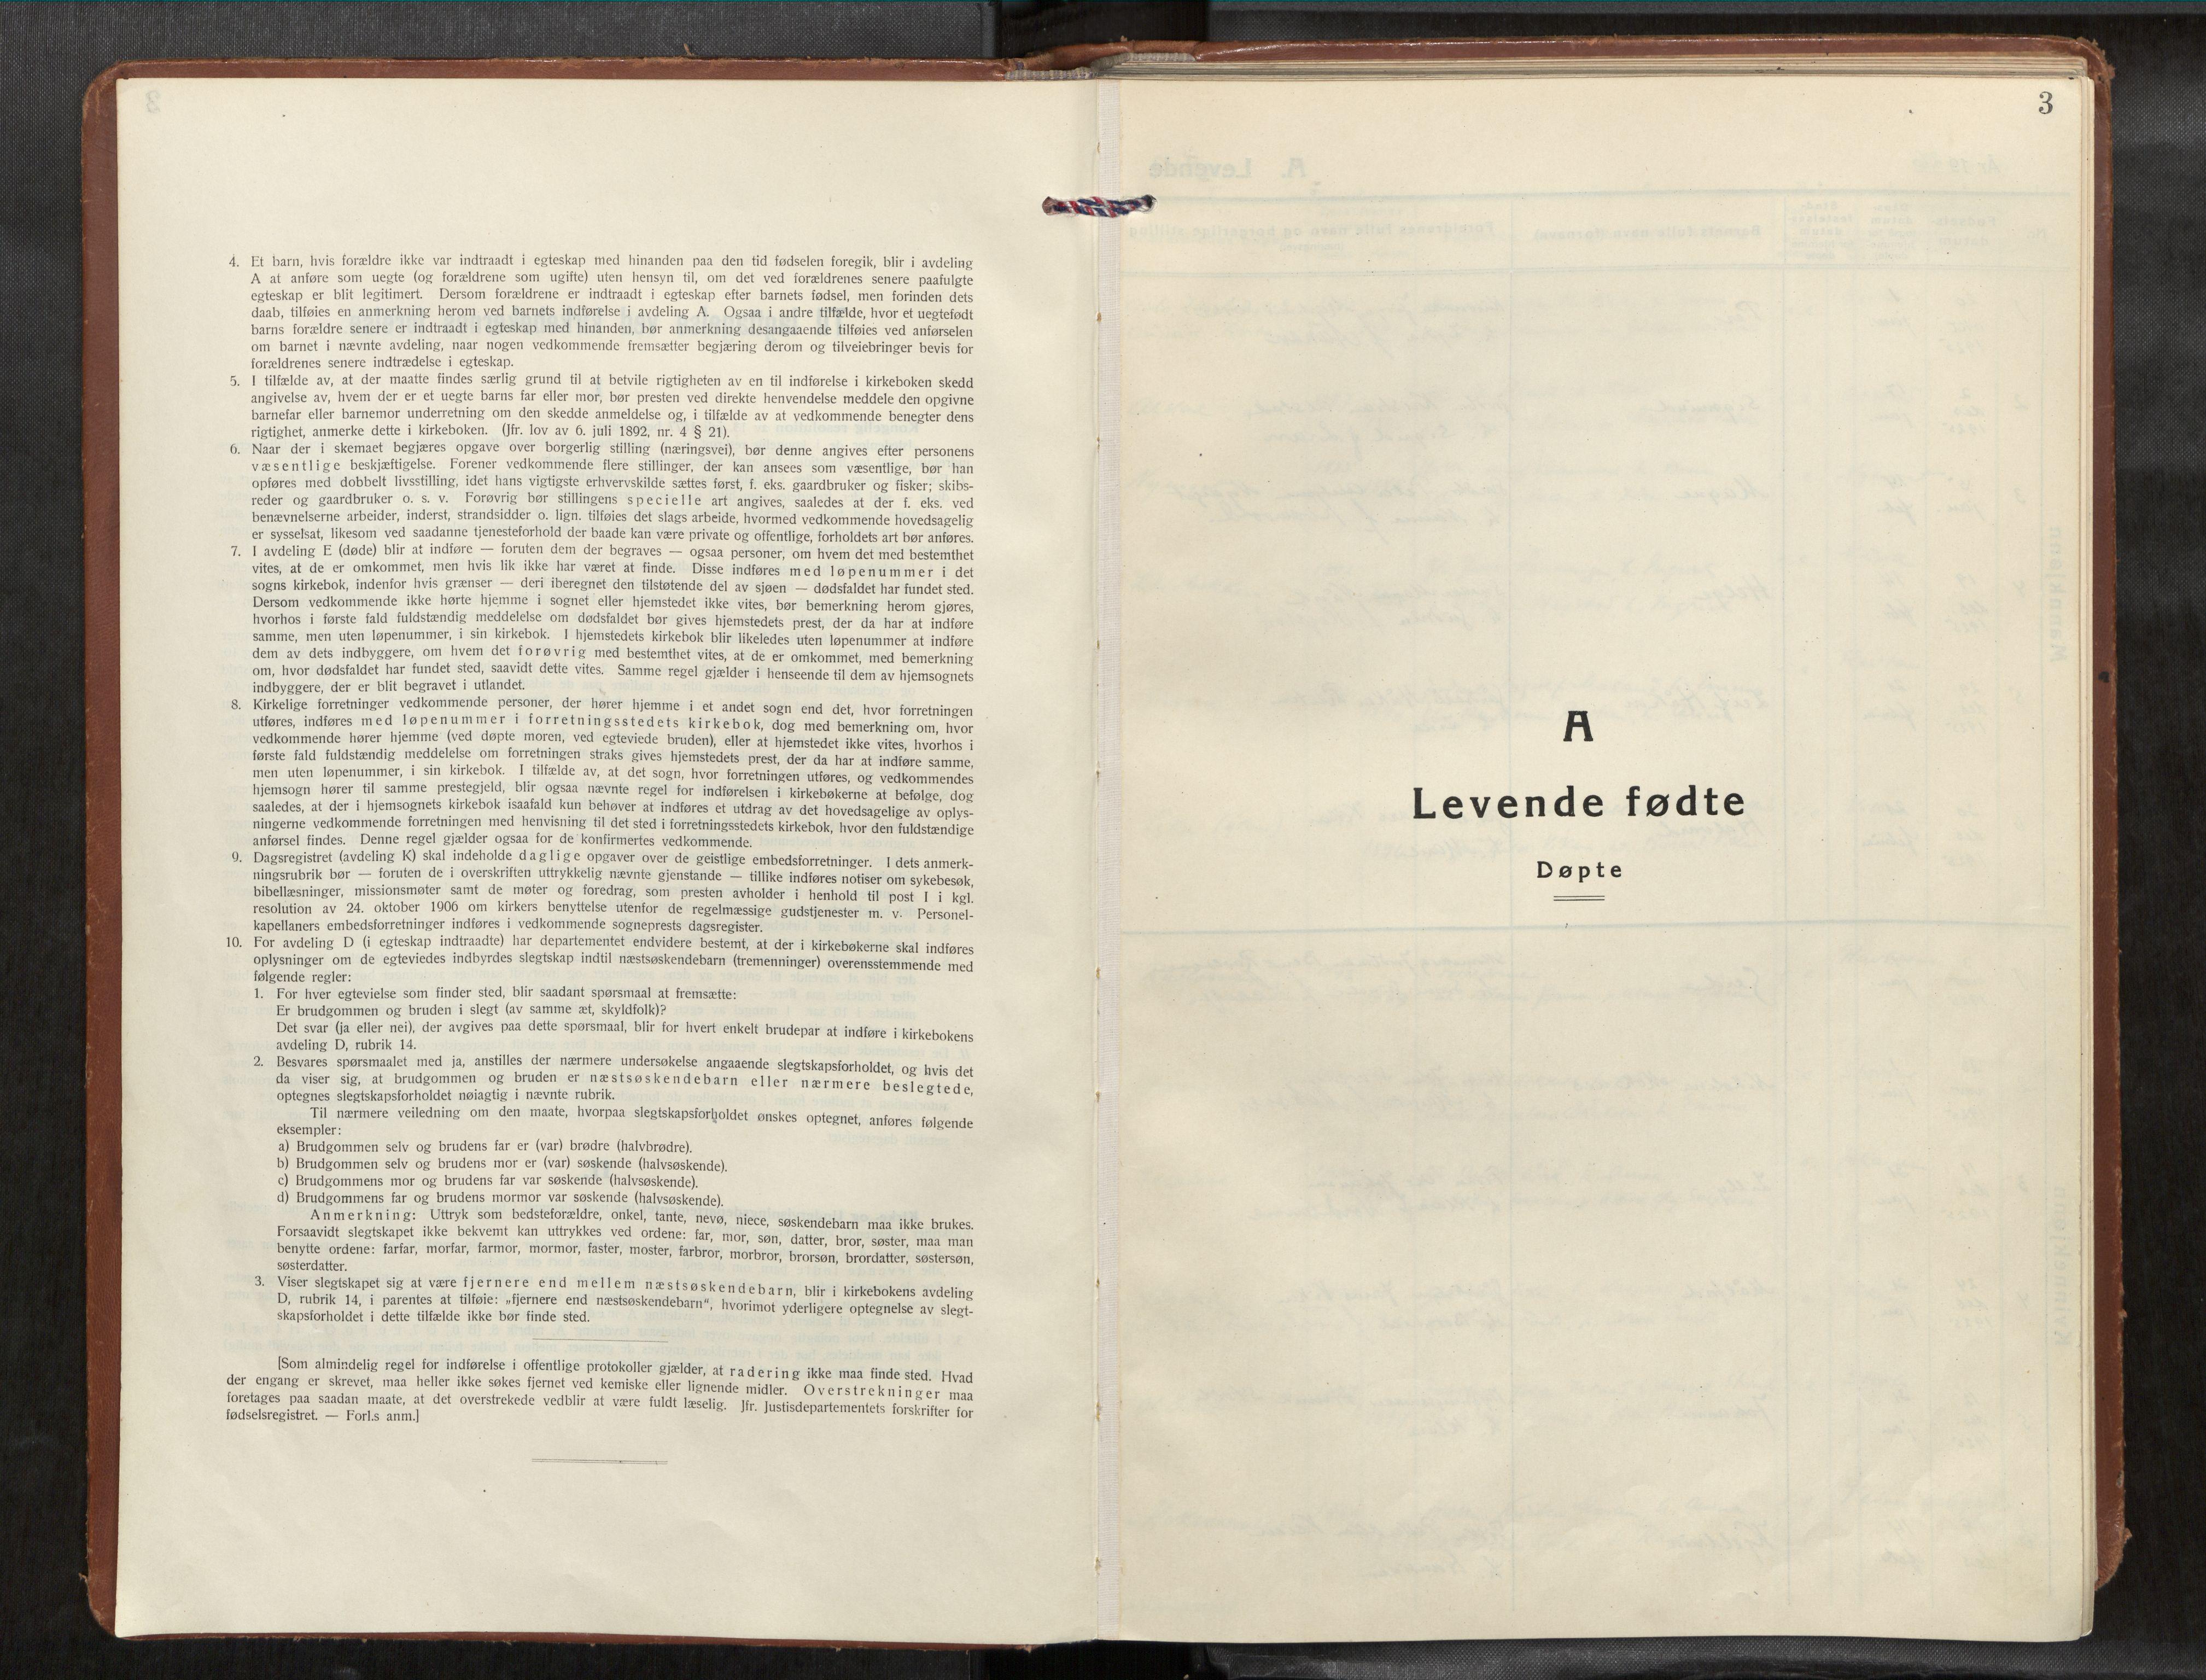 SAT, Frosta sokneprestkontor, H/Haa/L0001: Ministerialbok nr. 1, 1926-1934, s. 3